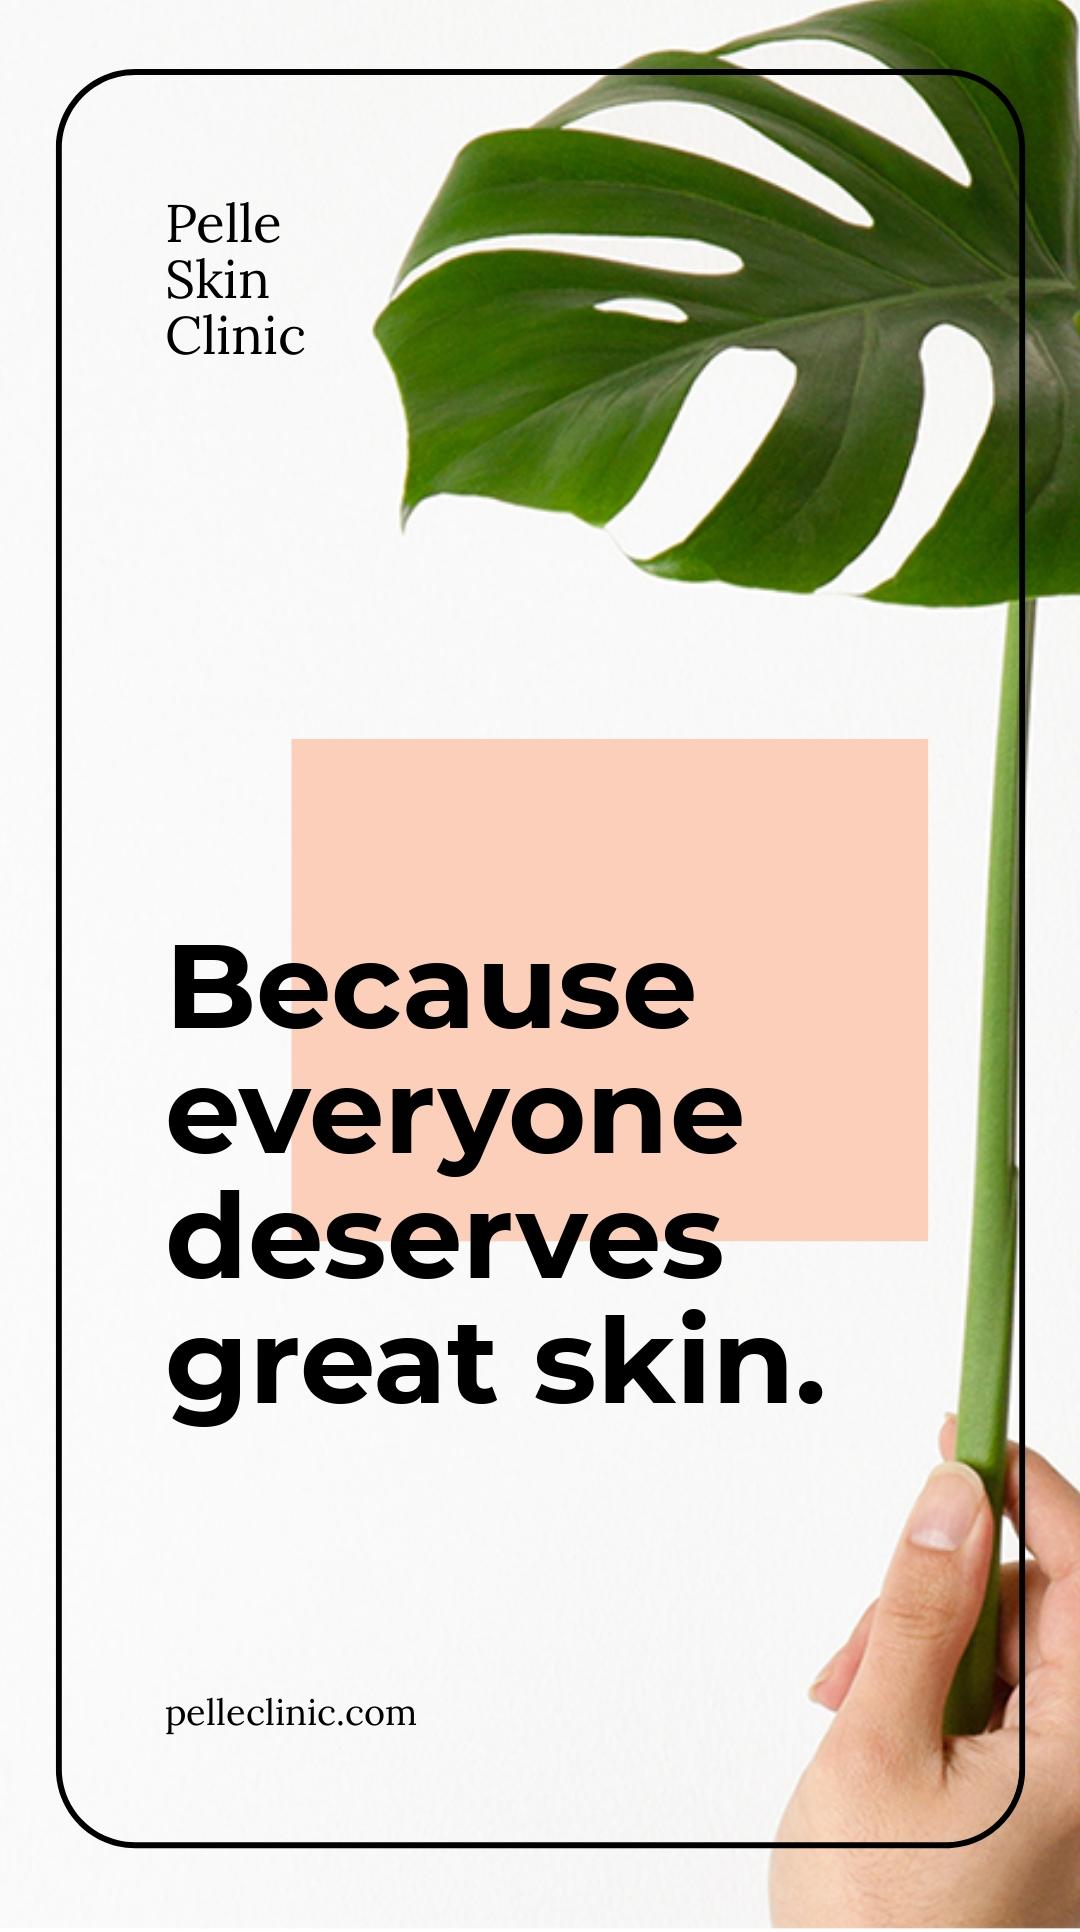 Free Skin Beauty clinic Whatsapp Template.jpe